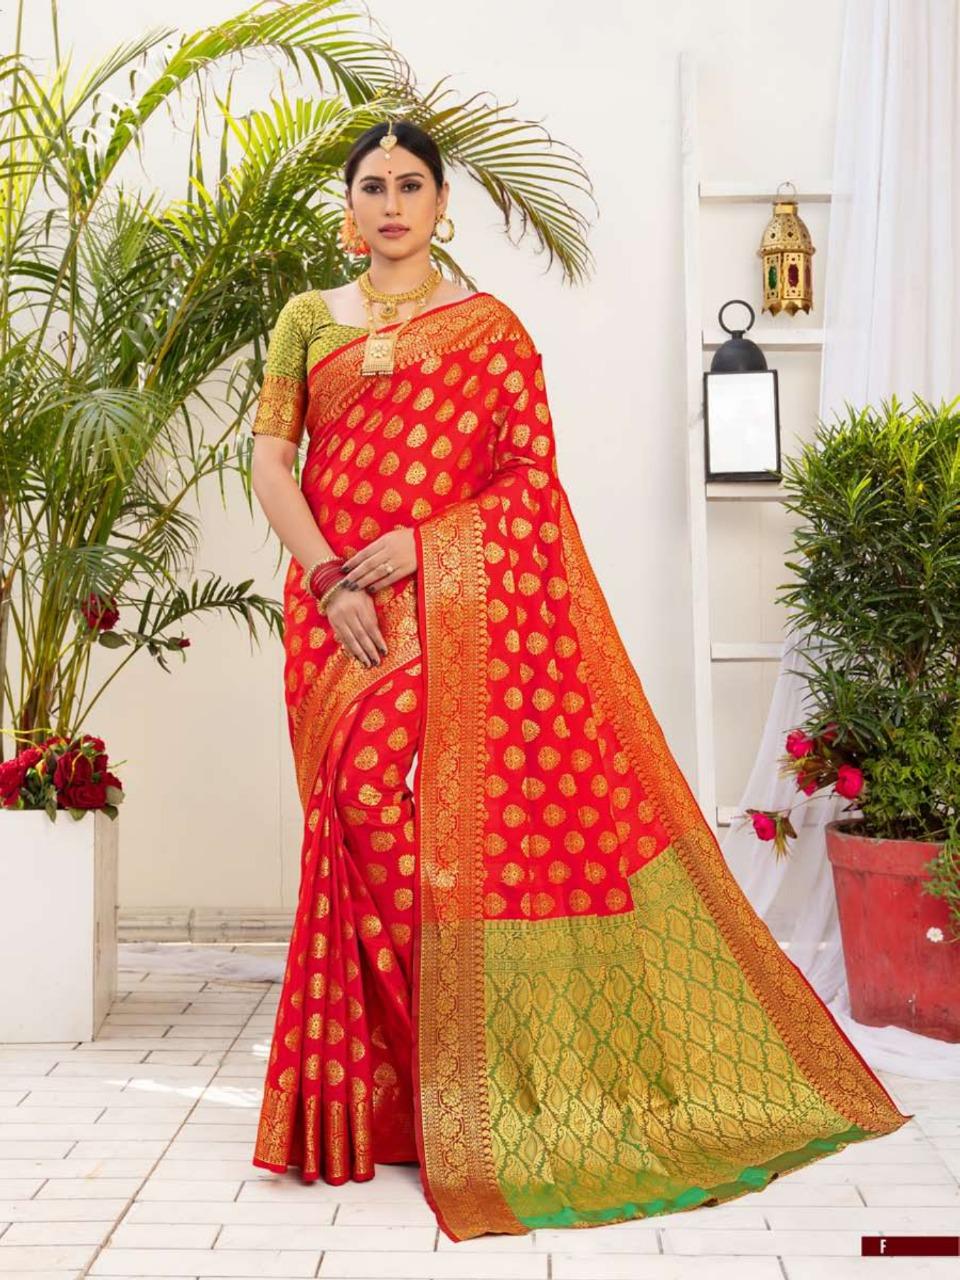 Shangrila  presents Vijaylaxmi Festive Wear Sarees Collection